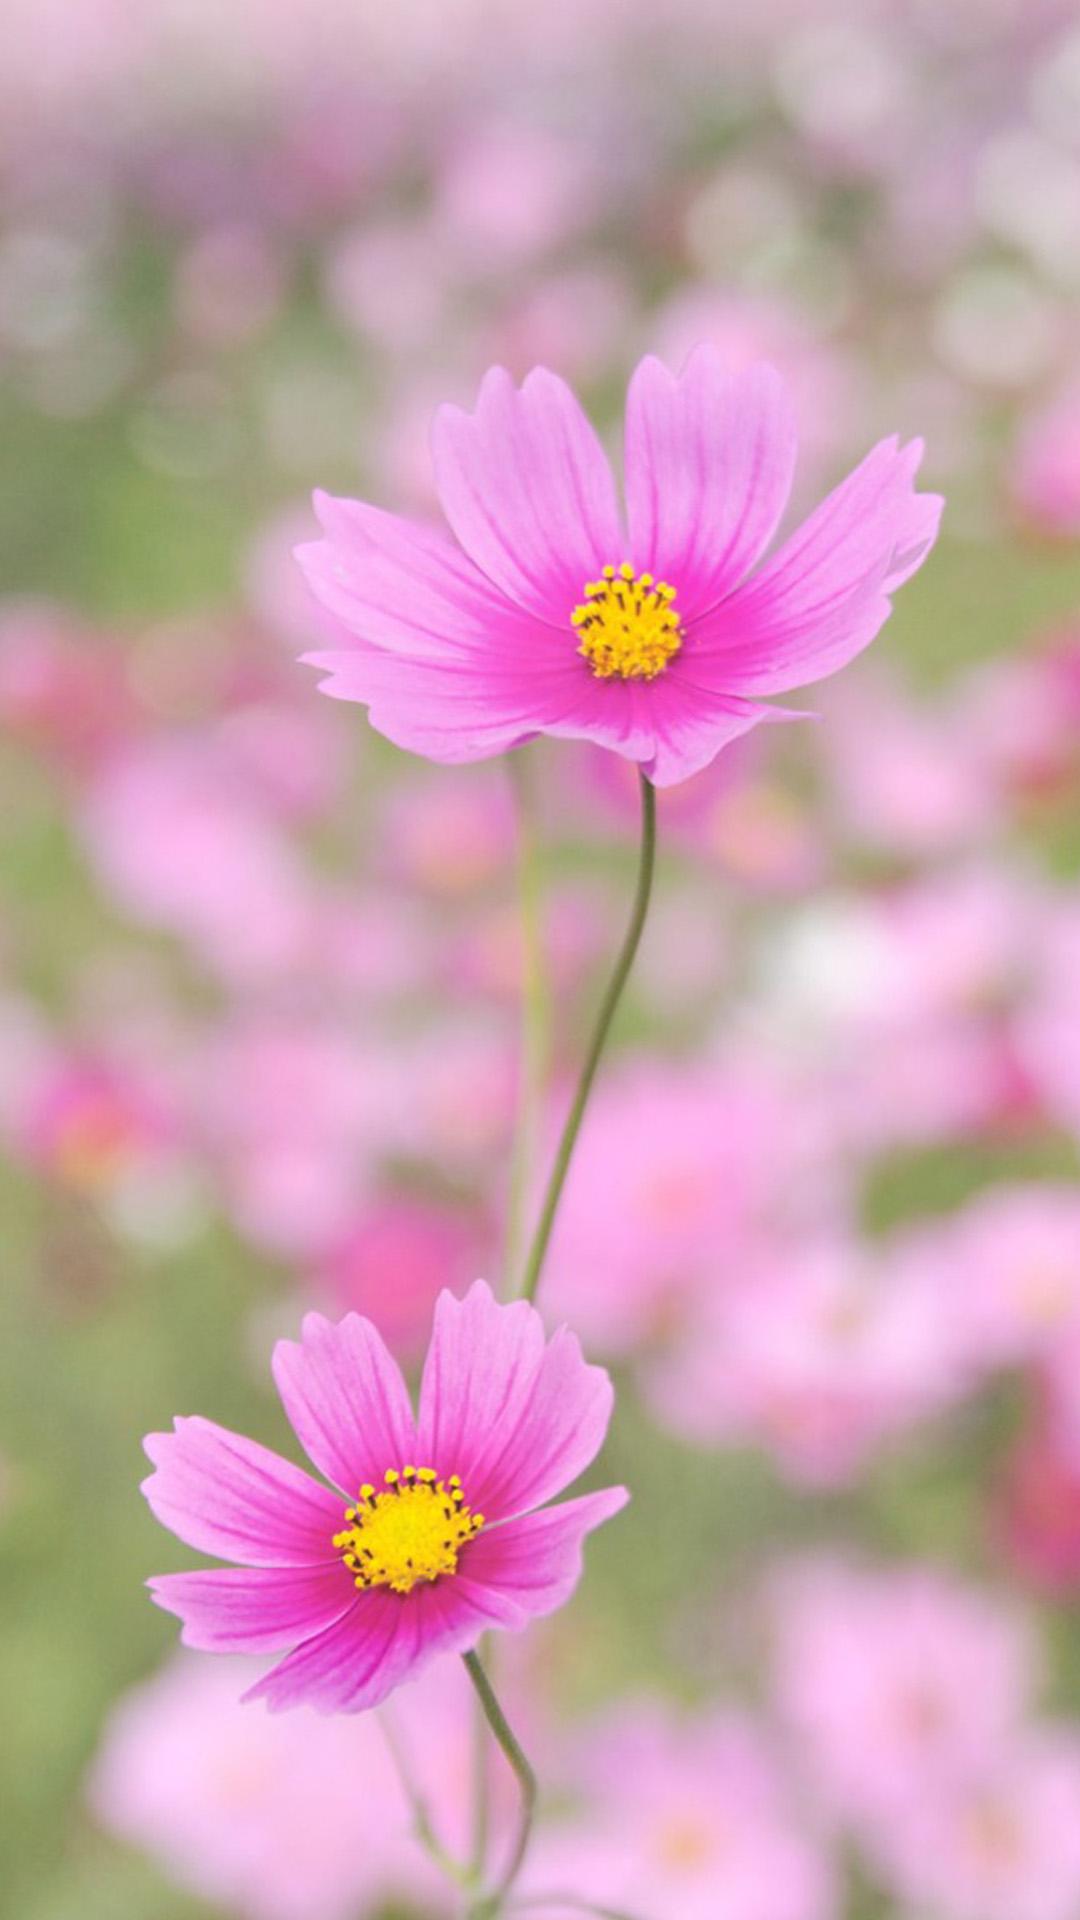 Download Hd Wallpapers Of Inspirational Quotes Flower Iphone Wallpapers Pixelstalk Net